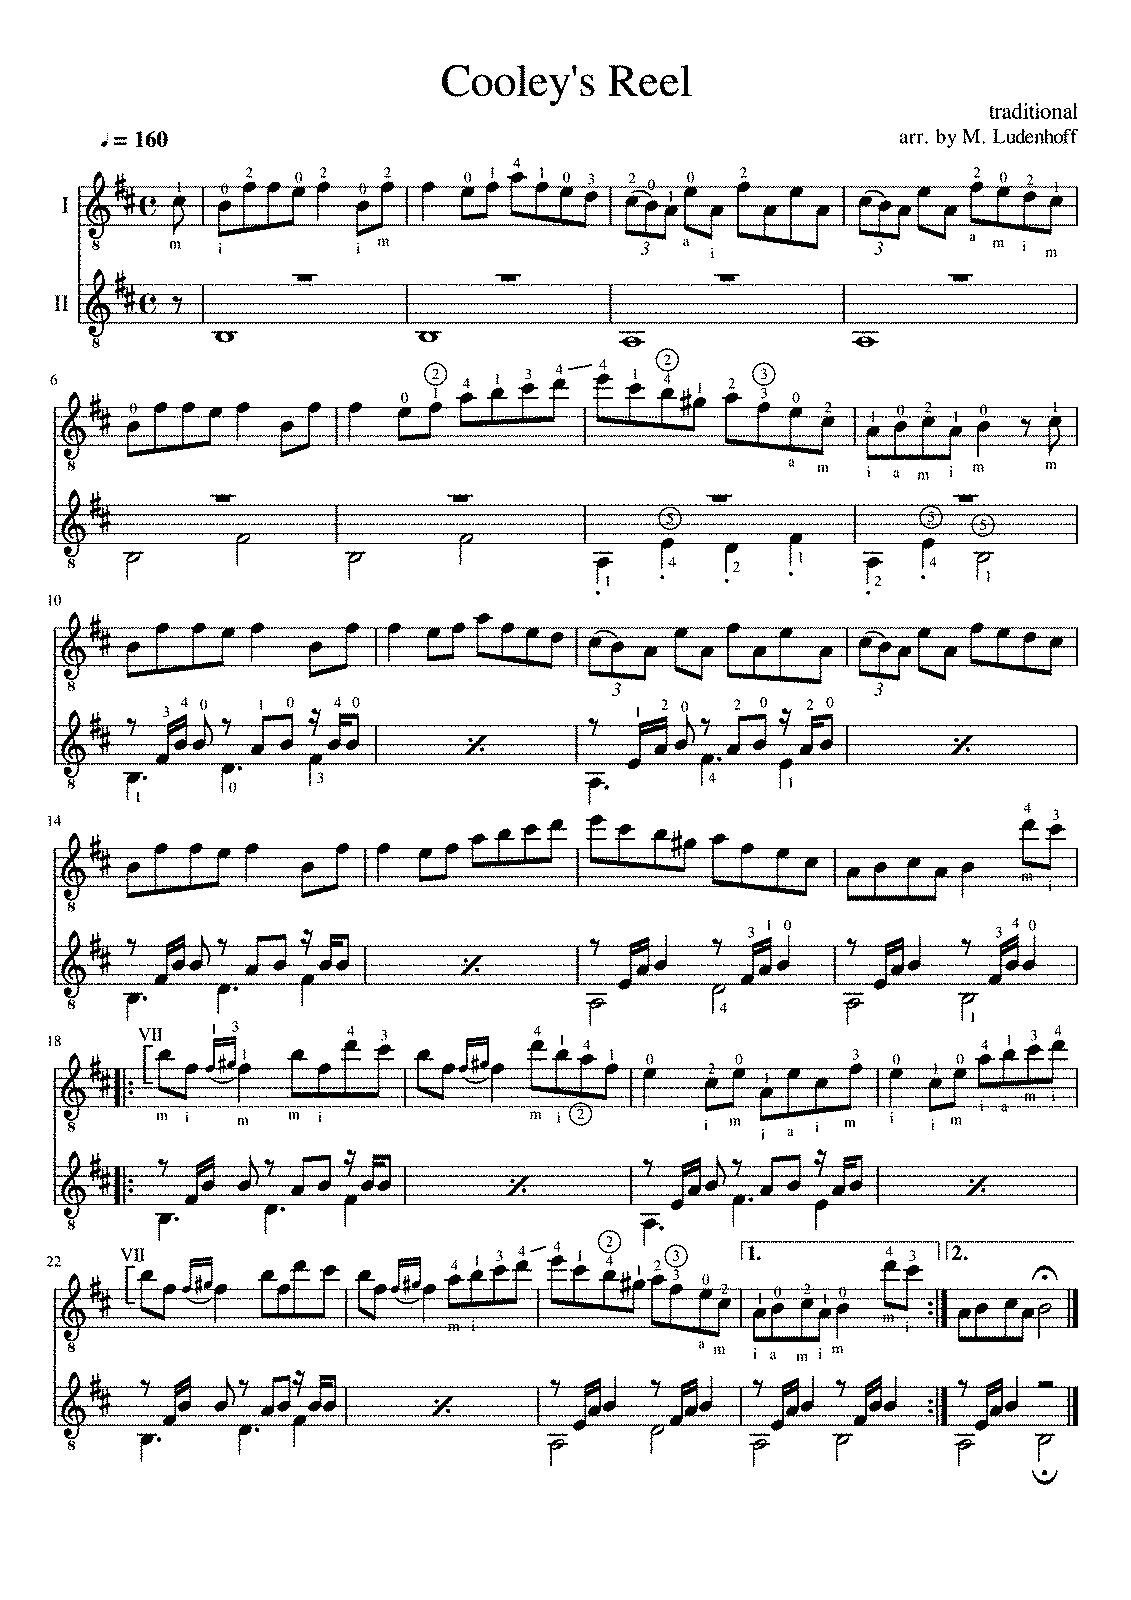 imslp petrucci music library